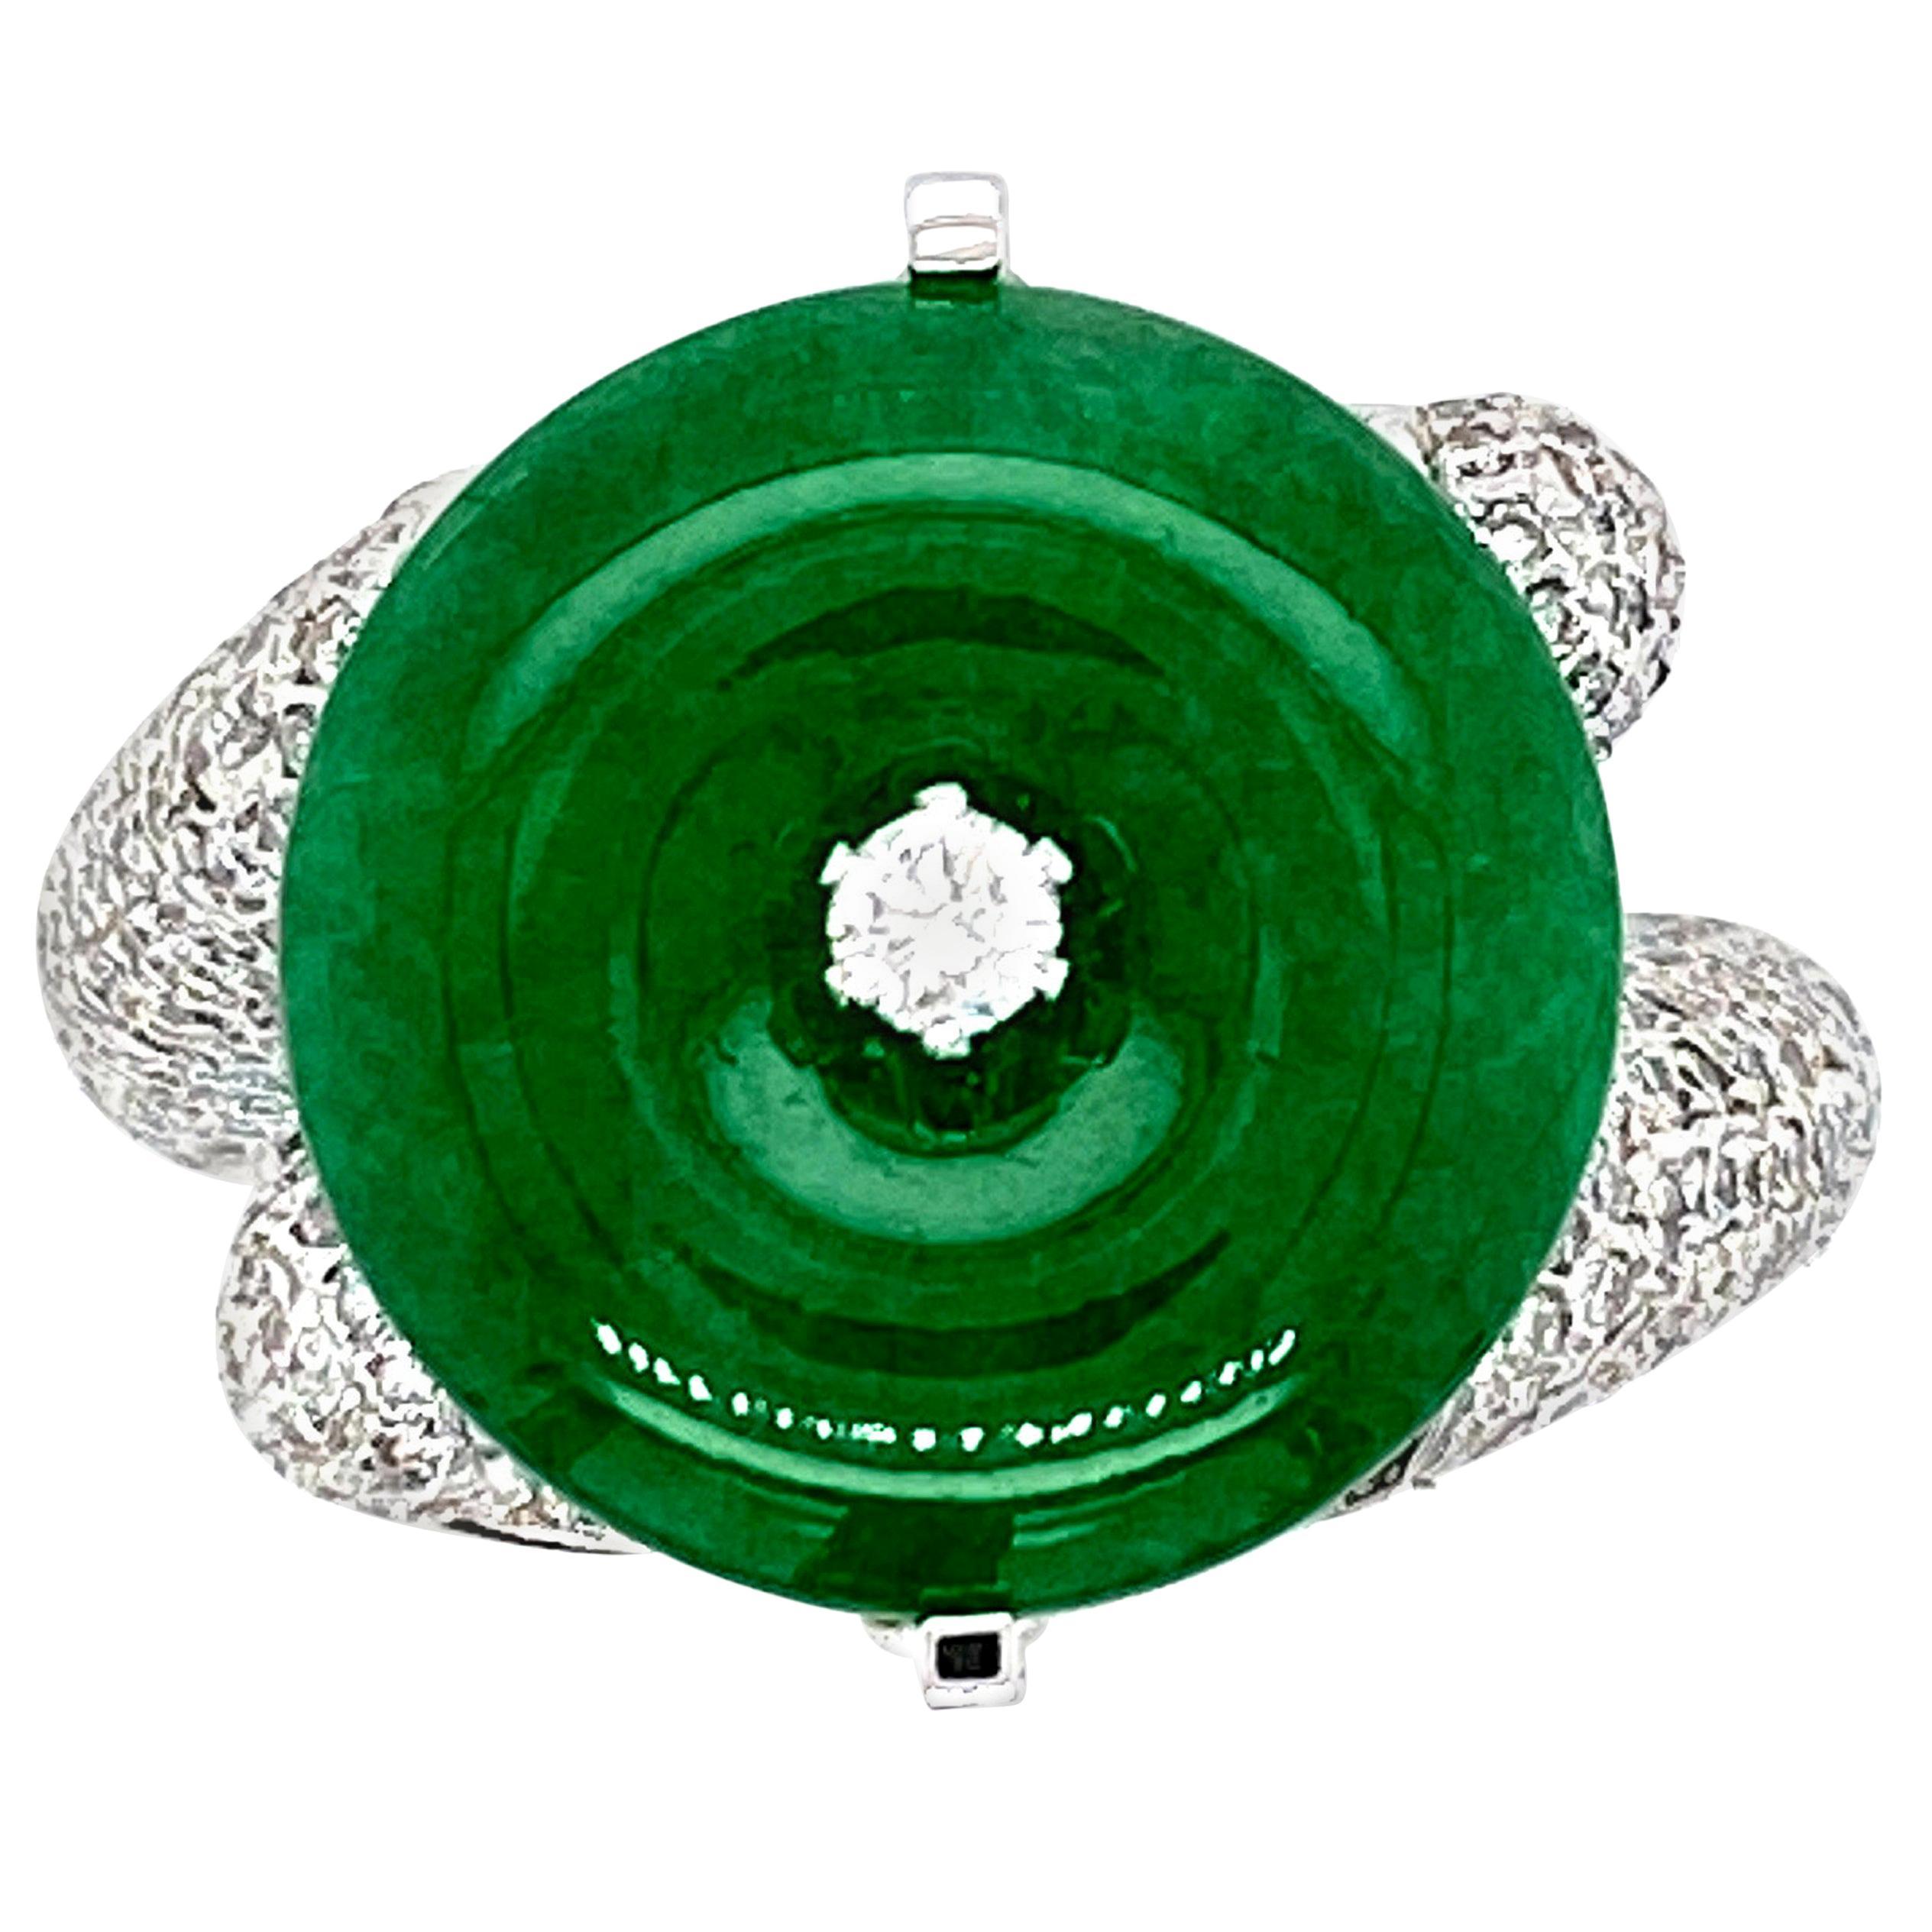 Certified Natural Jadeite and Diamond Engagement Ring in 18 Karat Gold